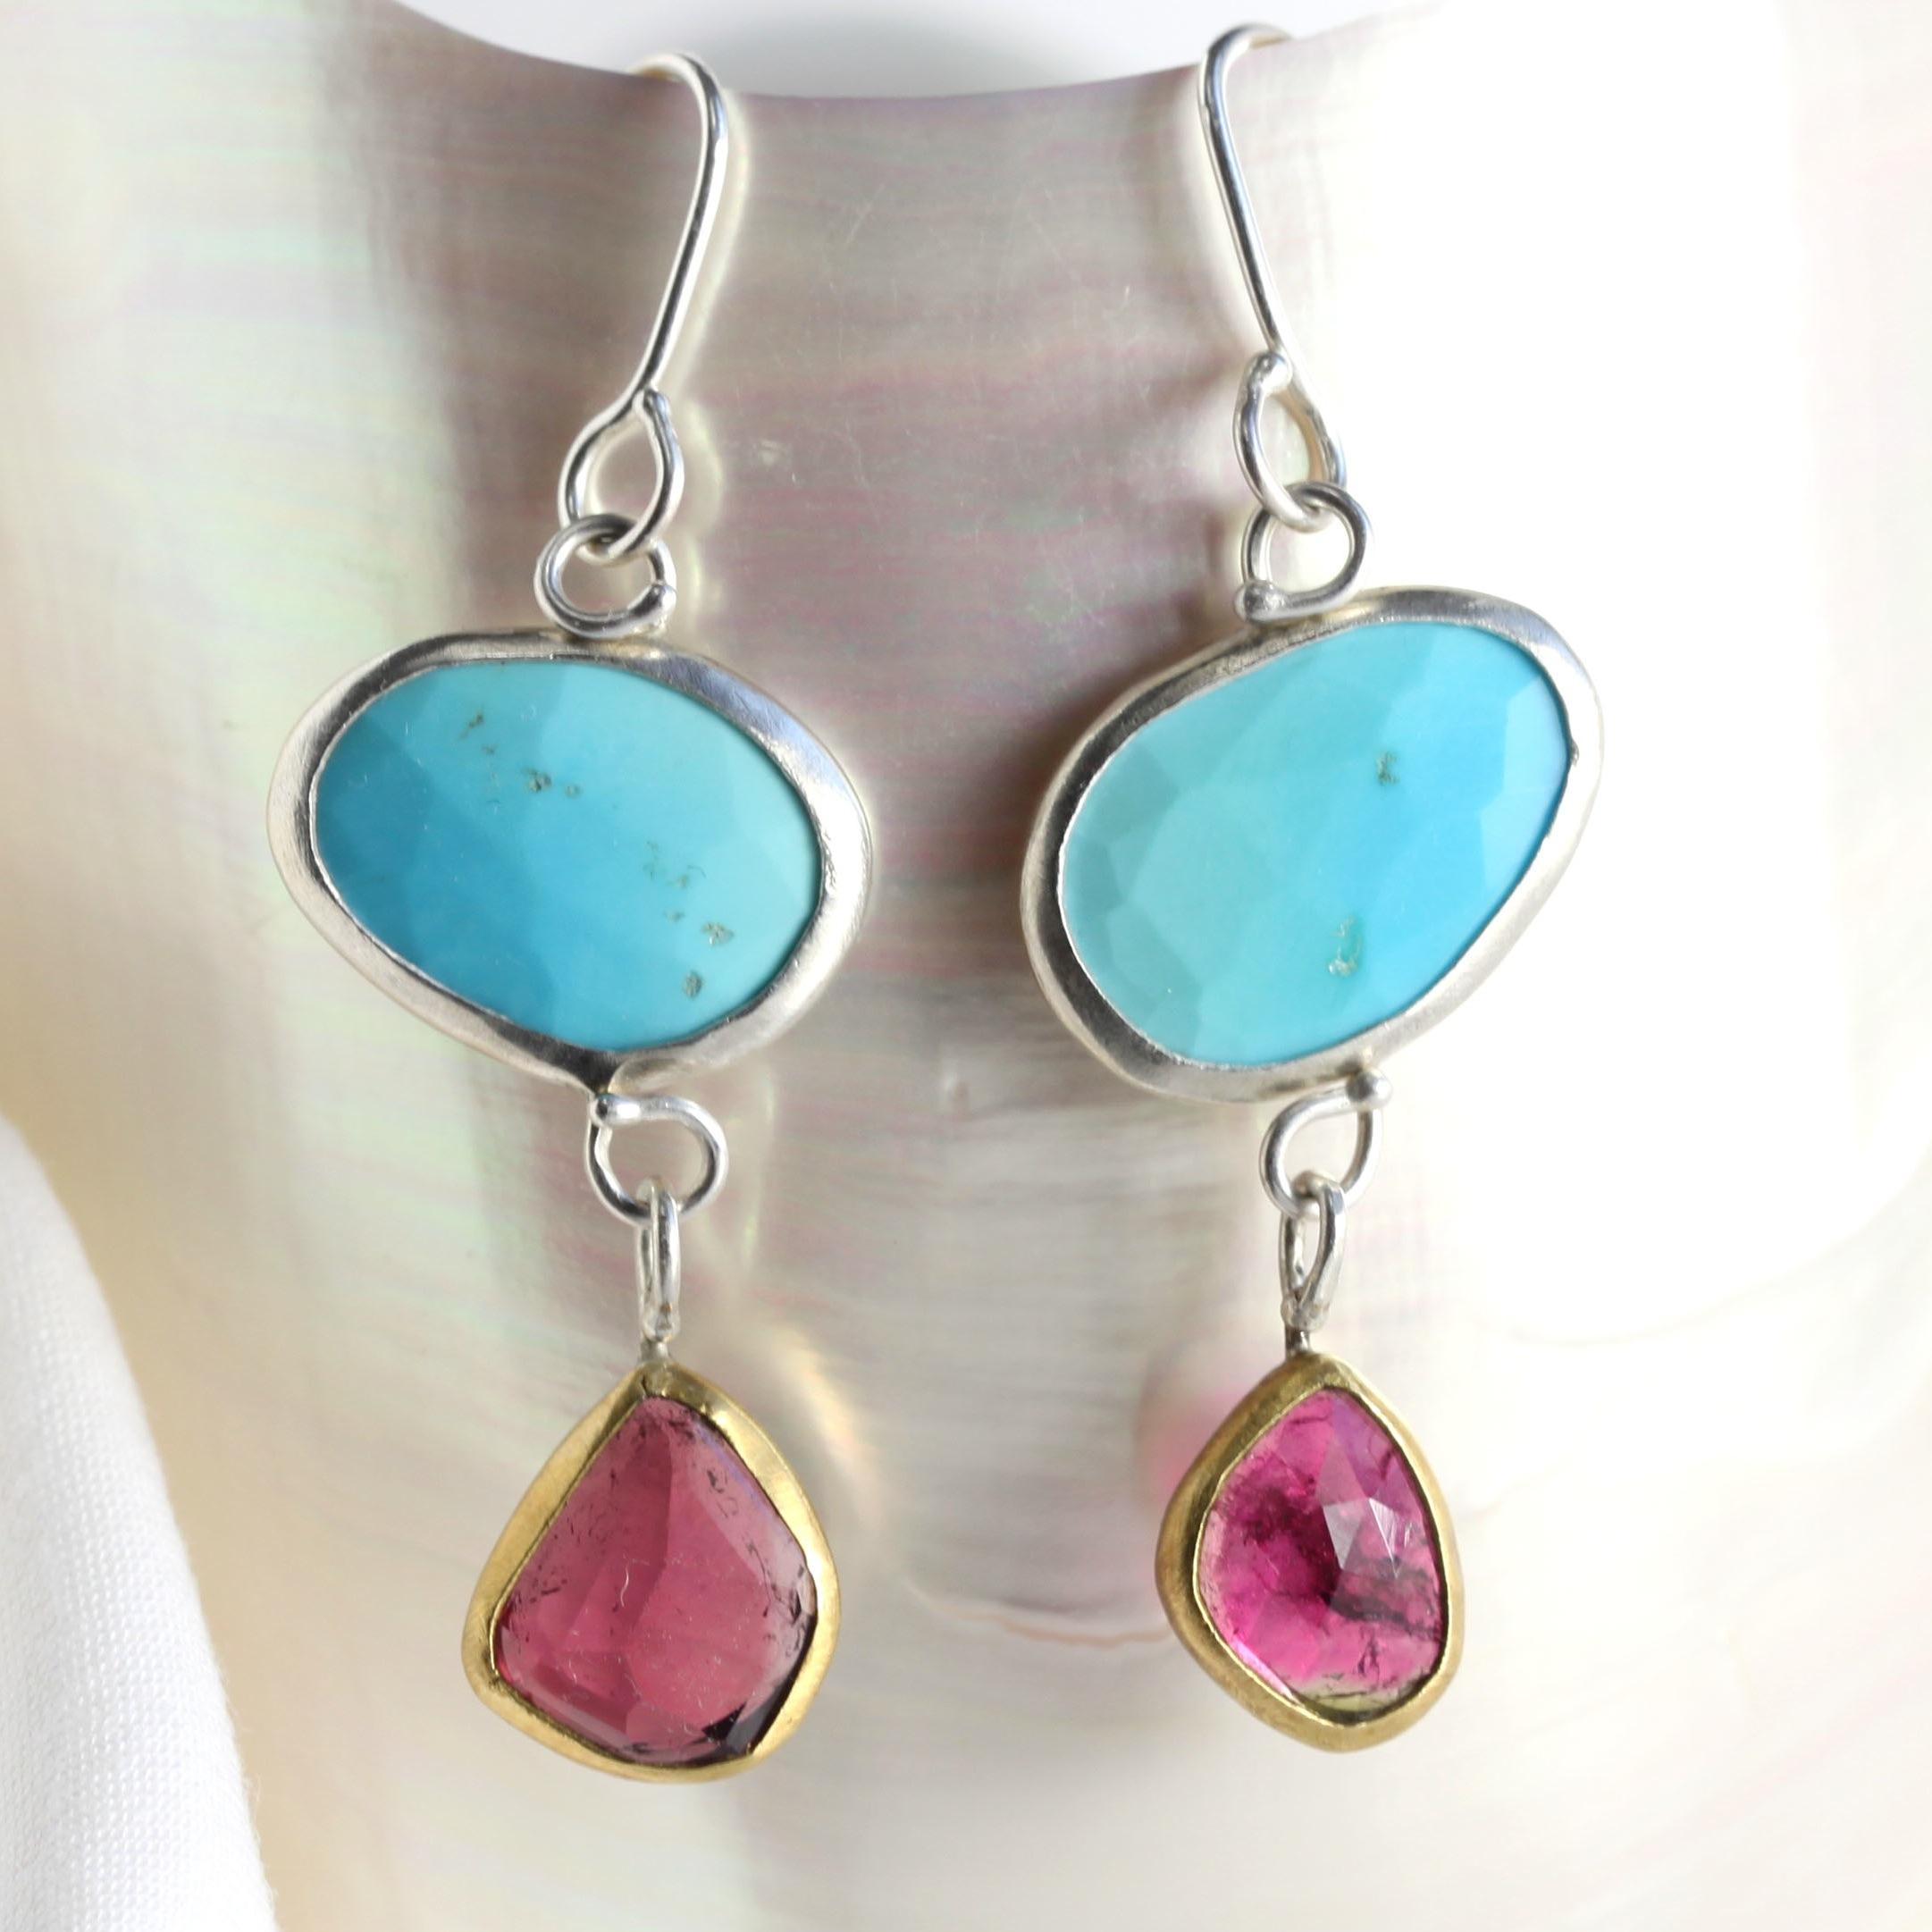 Rose Cut Turquoise Earrings With Rose Cut Rubelite Drops